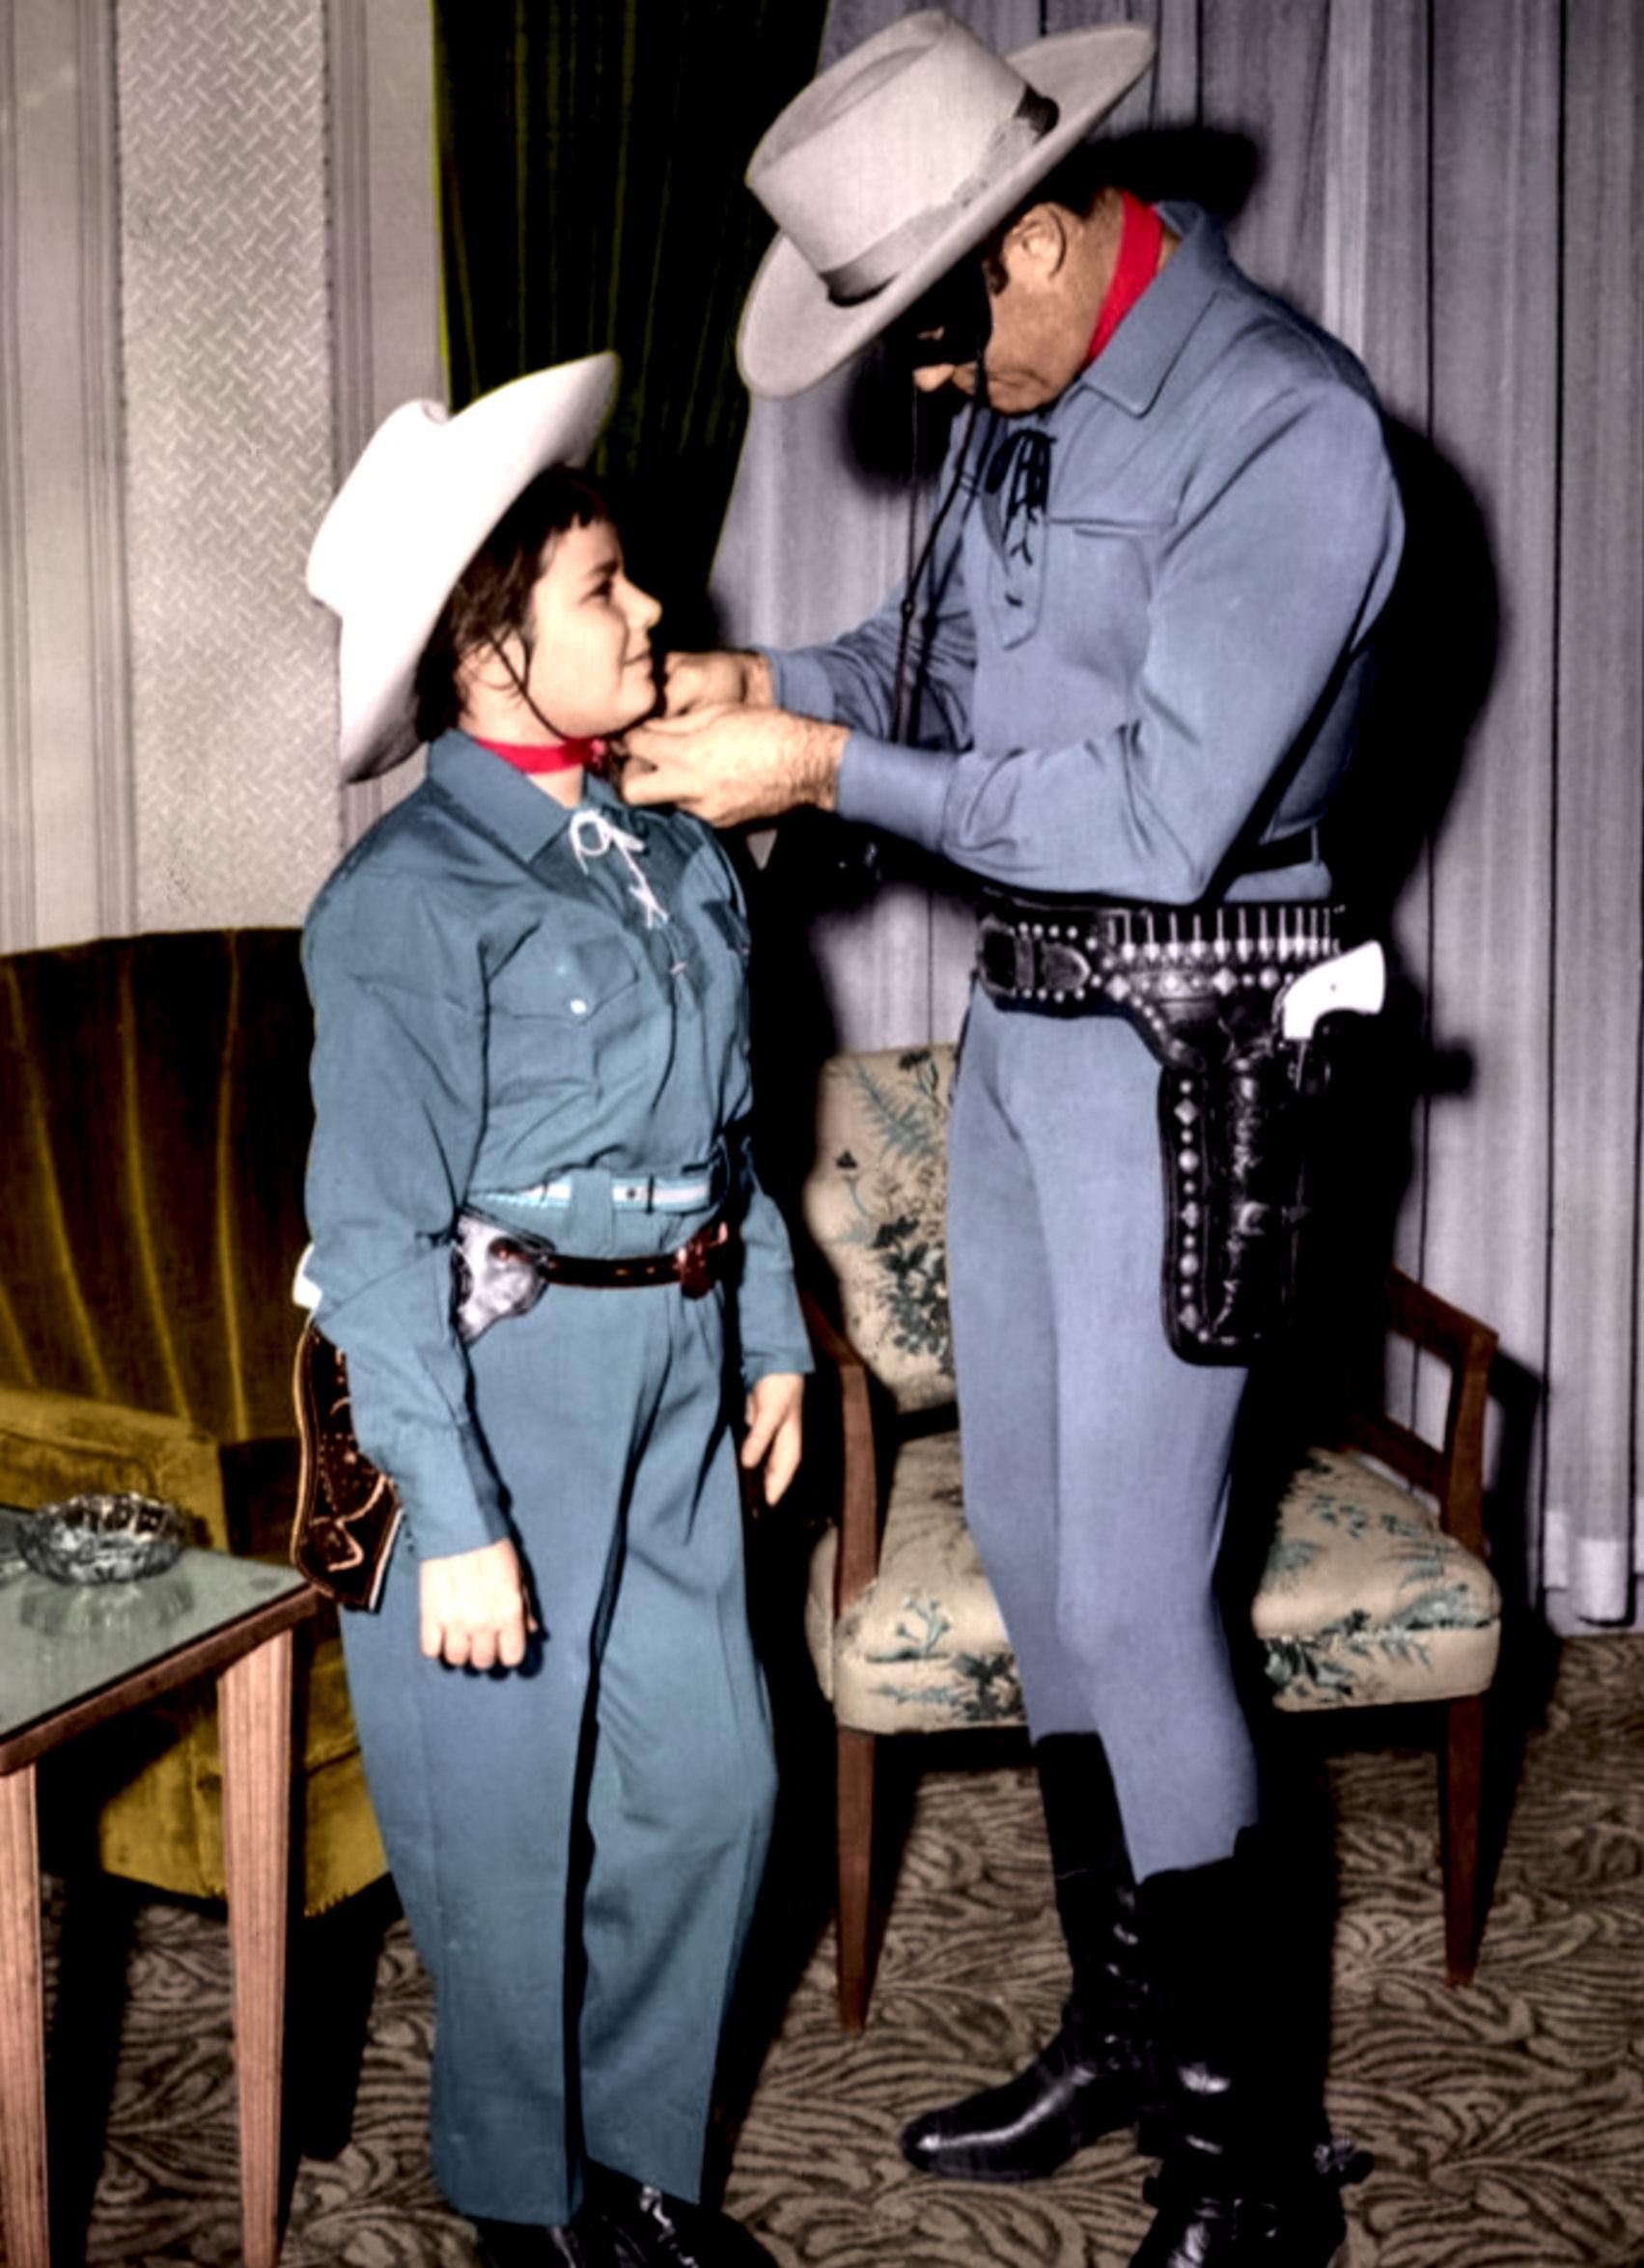 Clayton_Moore_Lone_Ranger_1956 (2)